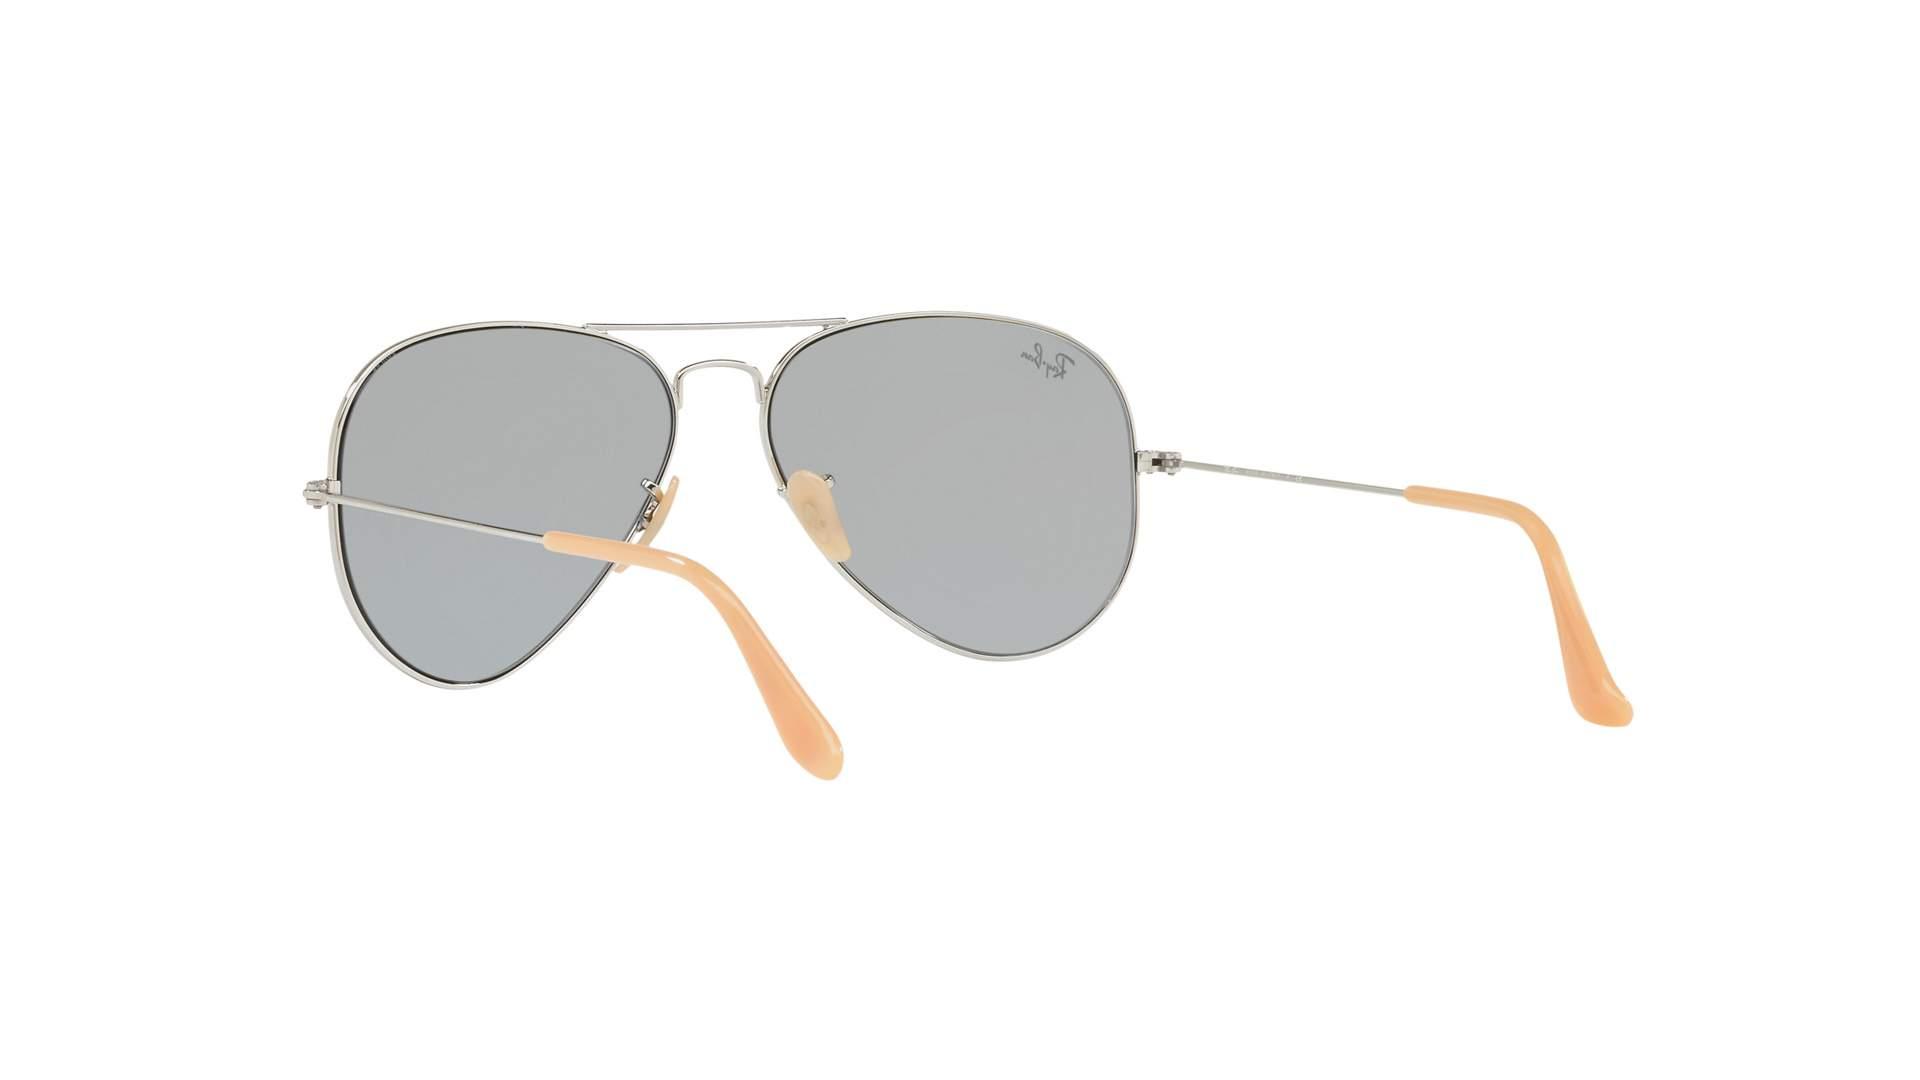 befa709c2 Sunglasses Ray-Ban Aviator Evolve Silver RB3025 9065/I5 58-14 Medium  Photochromic